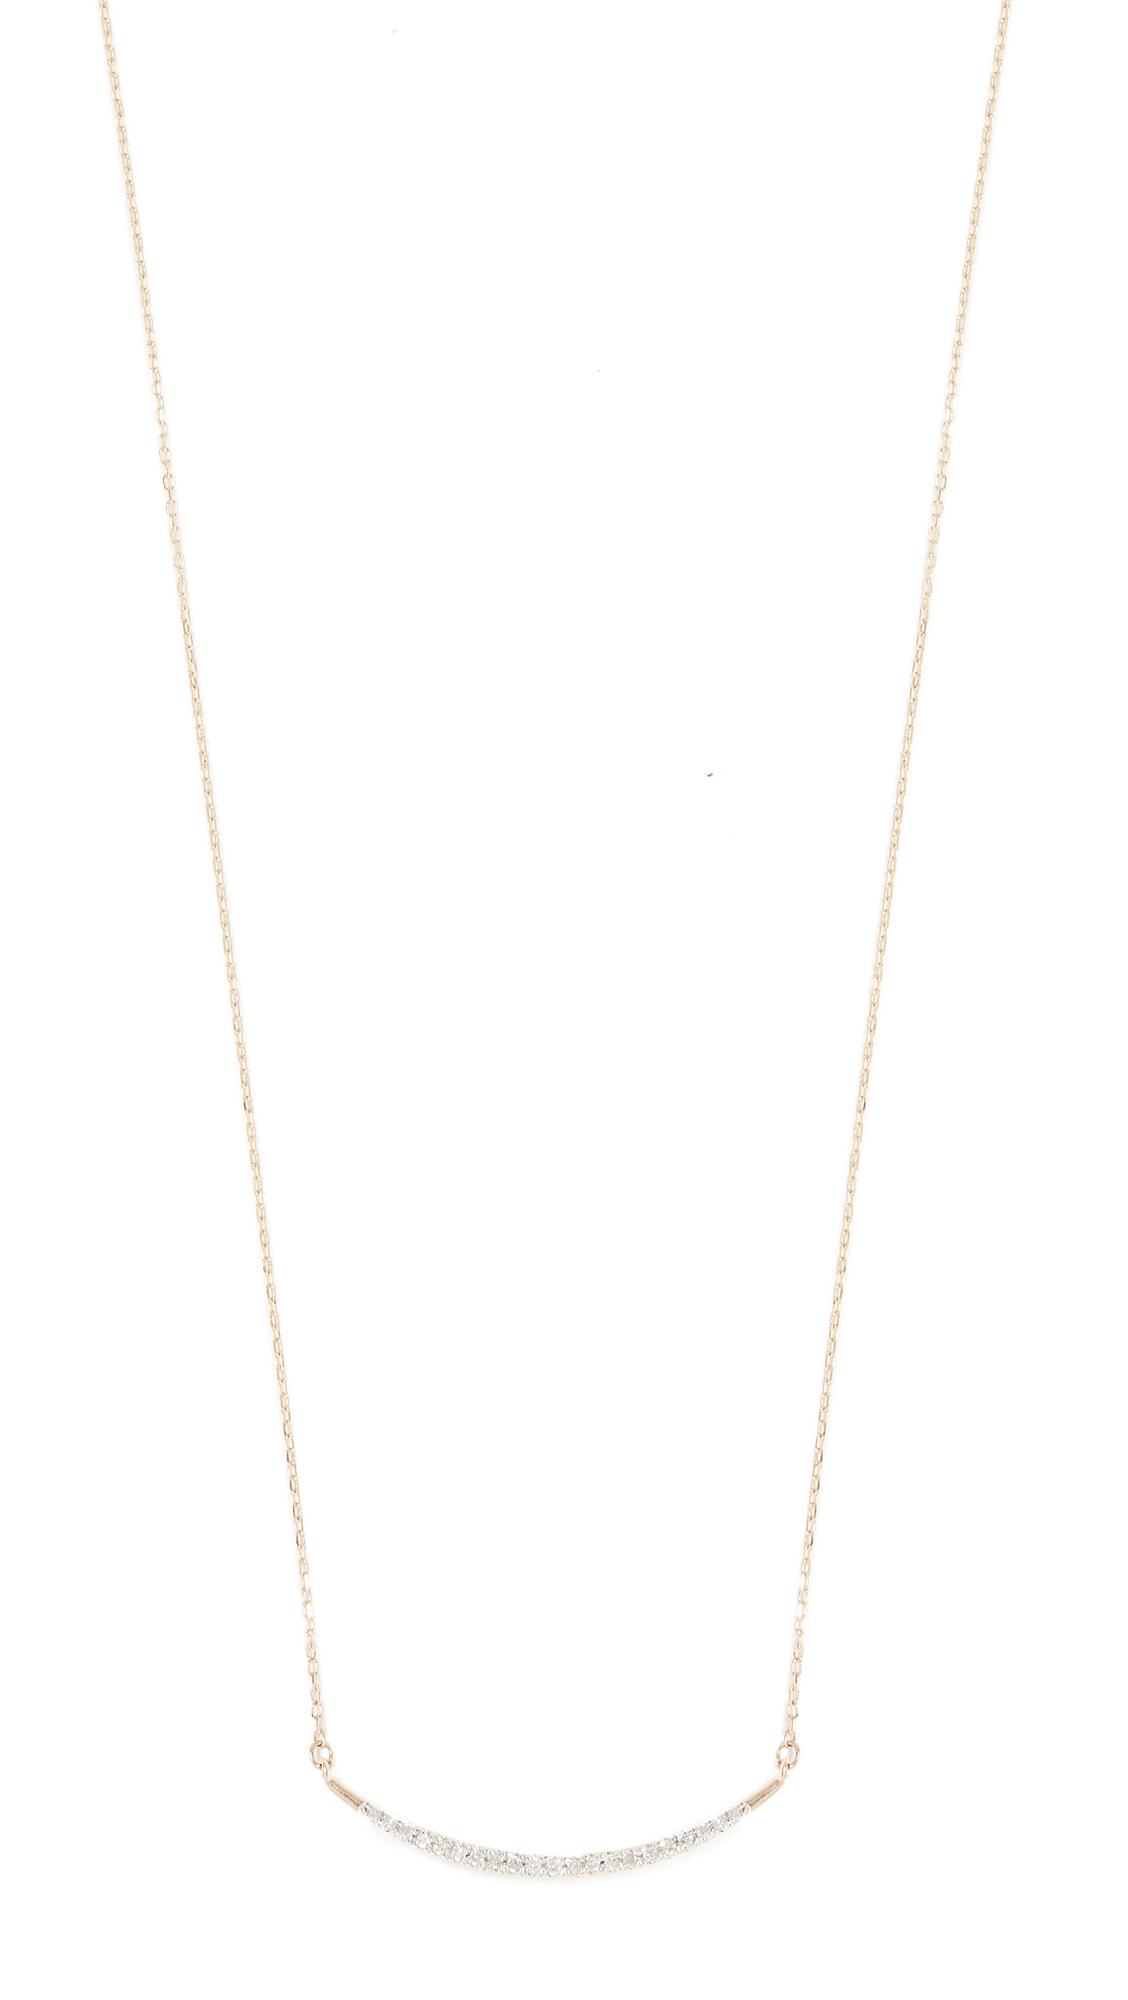 Adina Reyter 14k Gold Large Pave Curve Necklace - Gold/Clear